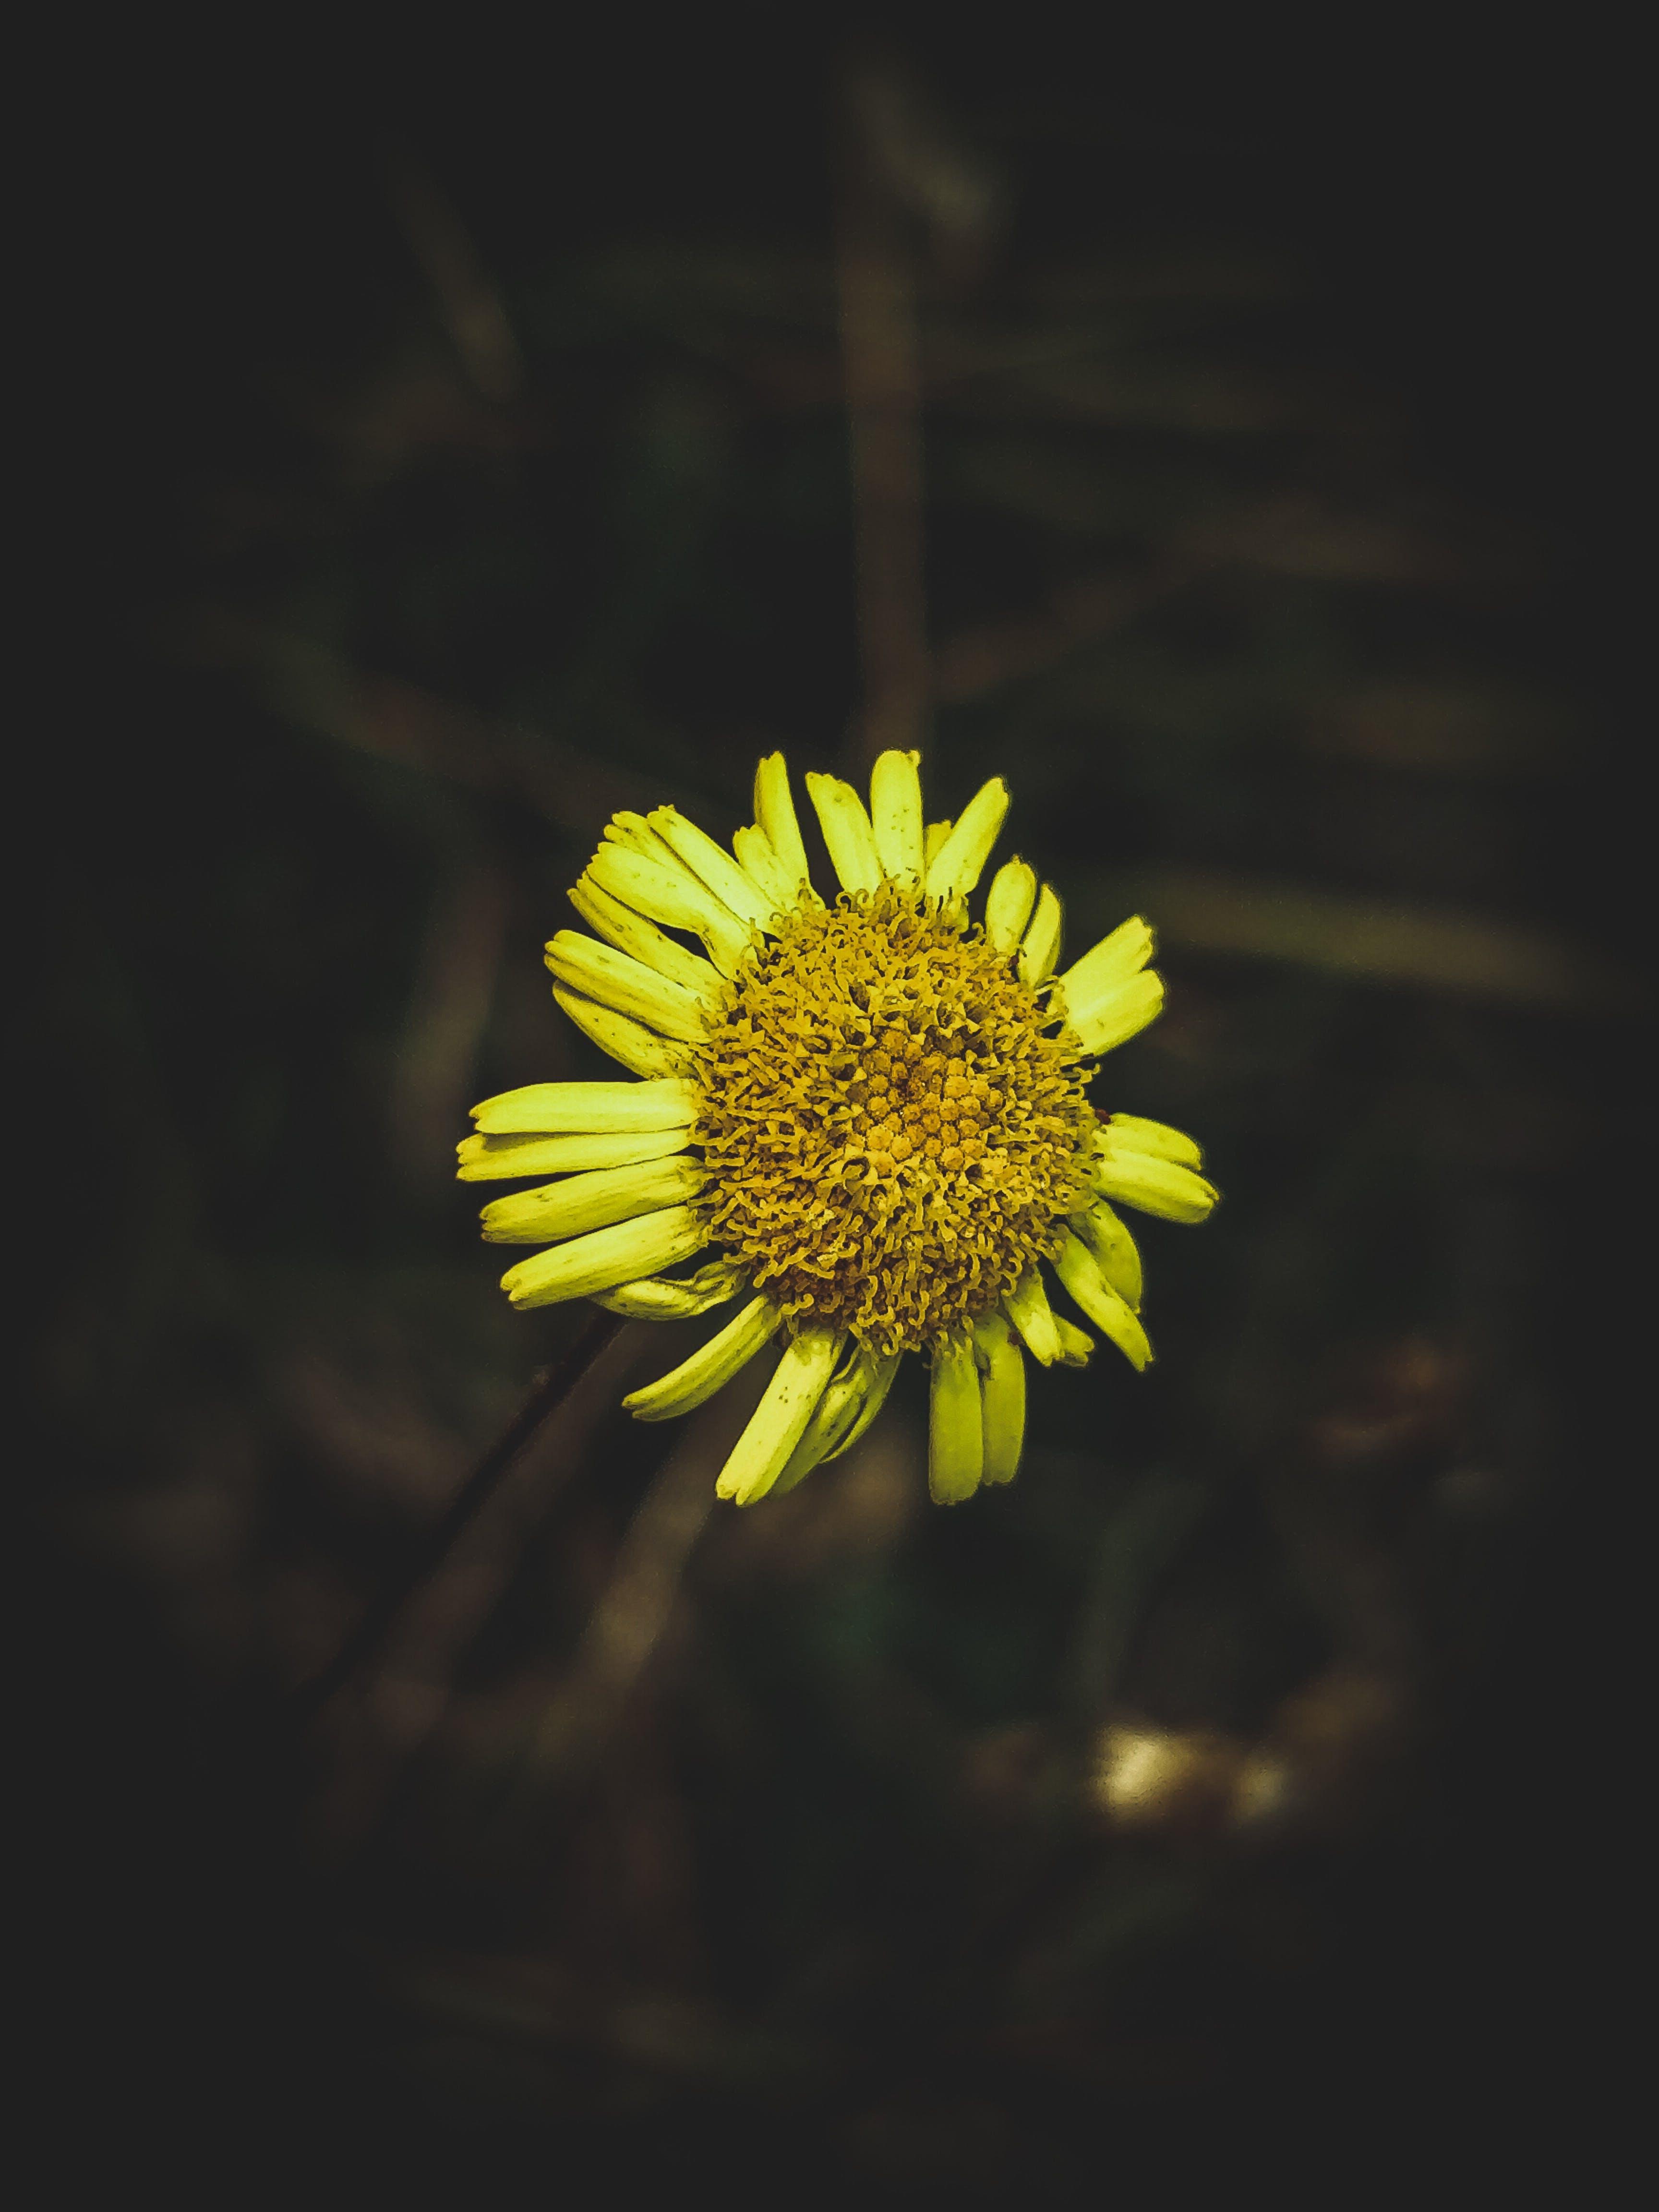 Free stock photo of sun flower, yellow